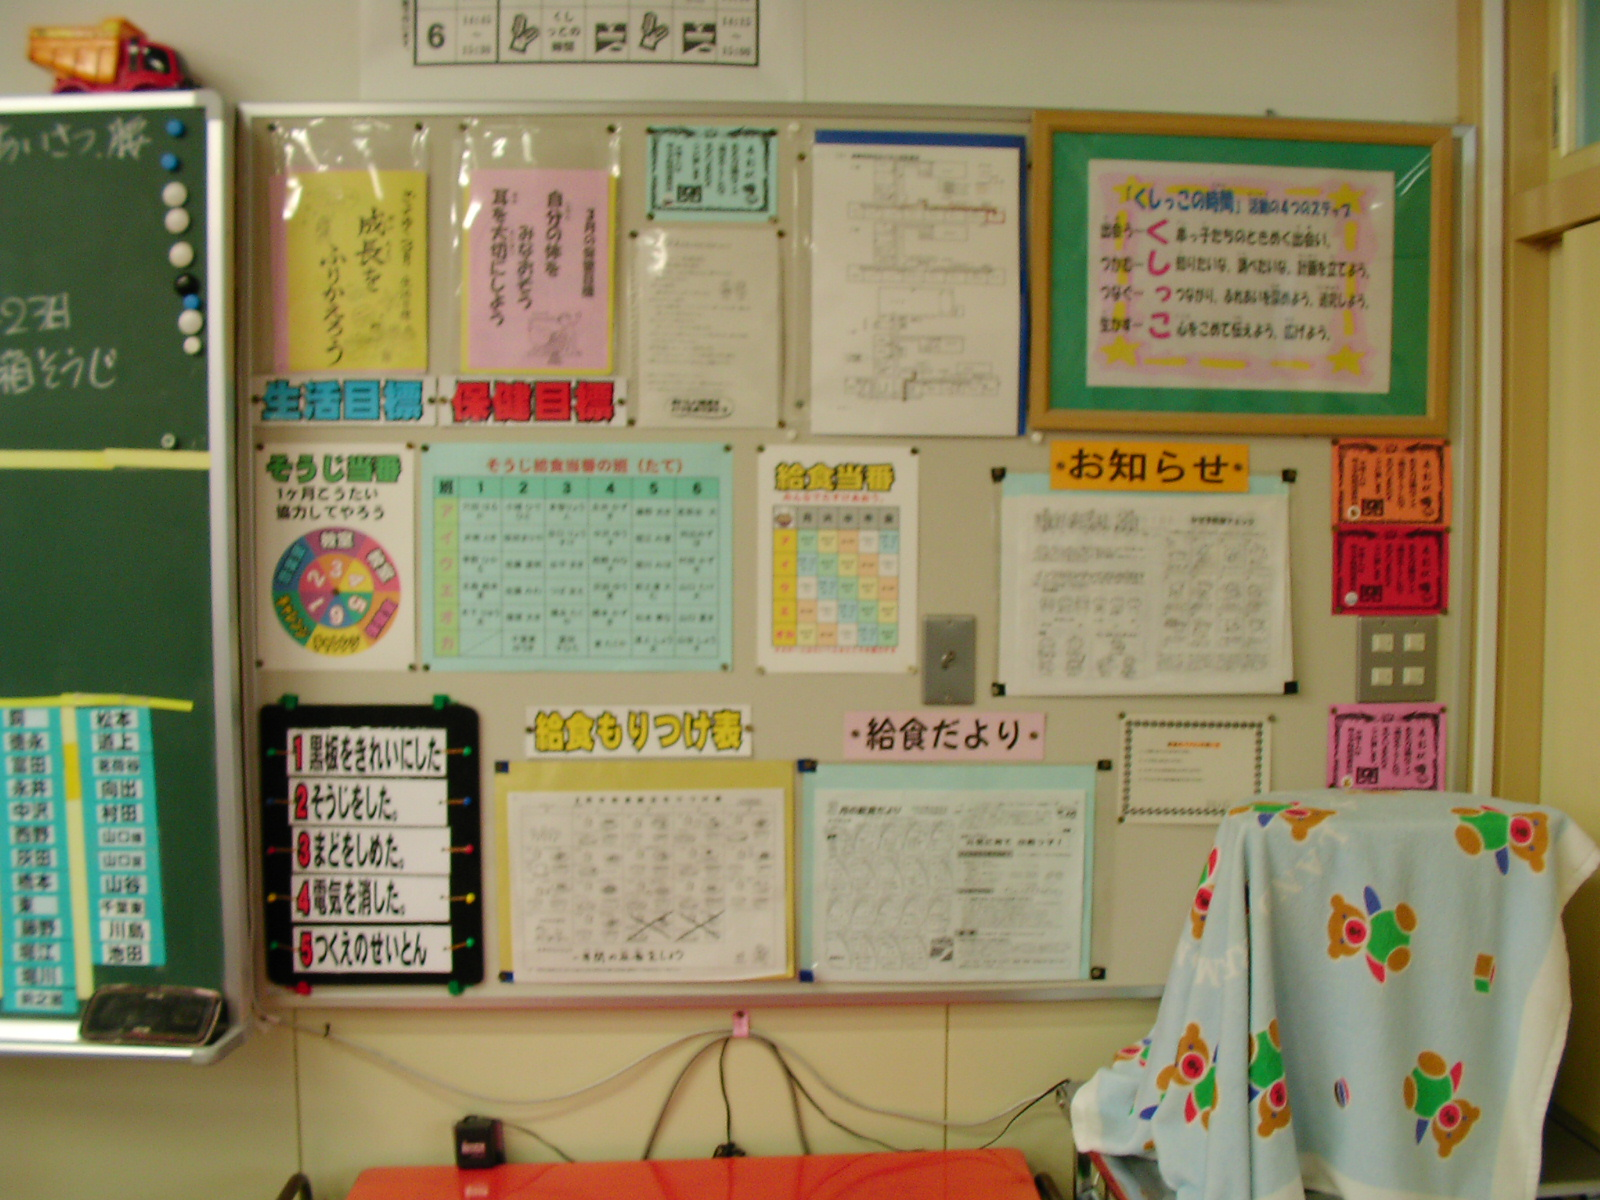 SANY0085.JPG: 教室の掲示物 ... : 漢字表 1年生 : 漢字